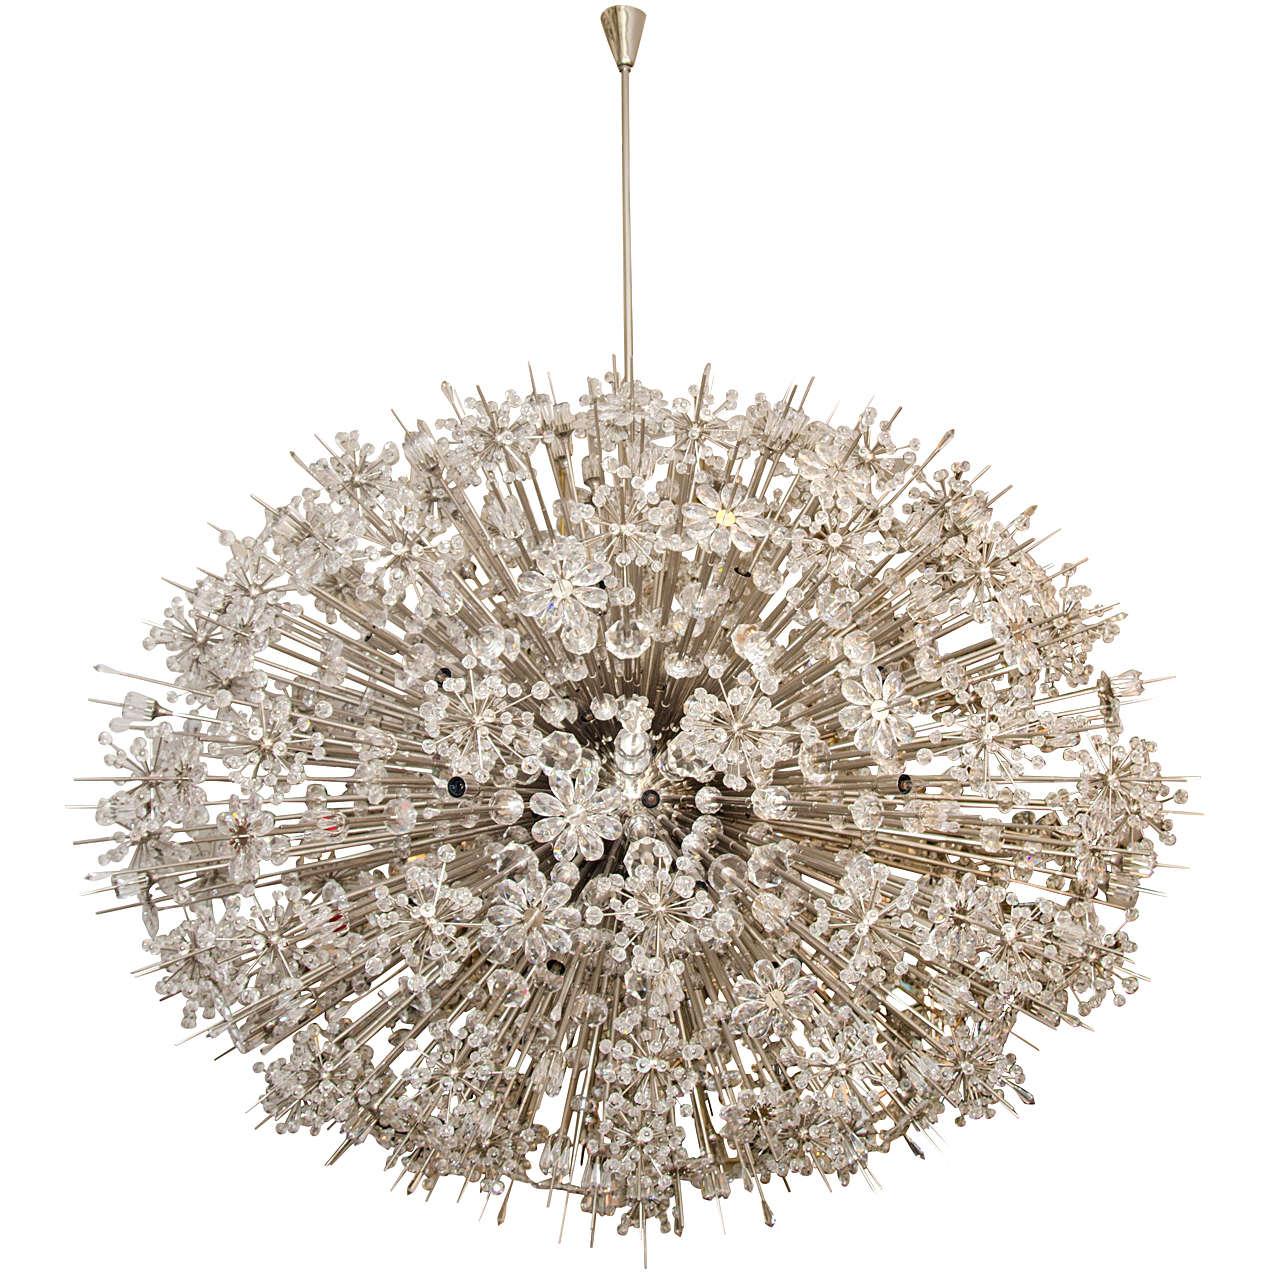 Monumental sputnik chandelier by lobmeyr at 1stdibs monumental sputnik chandelier by lobmeyr for sale aloadofball Image collections